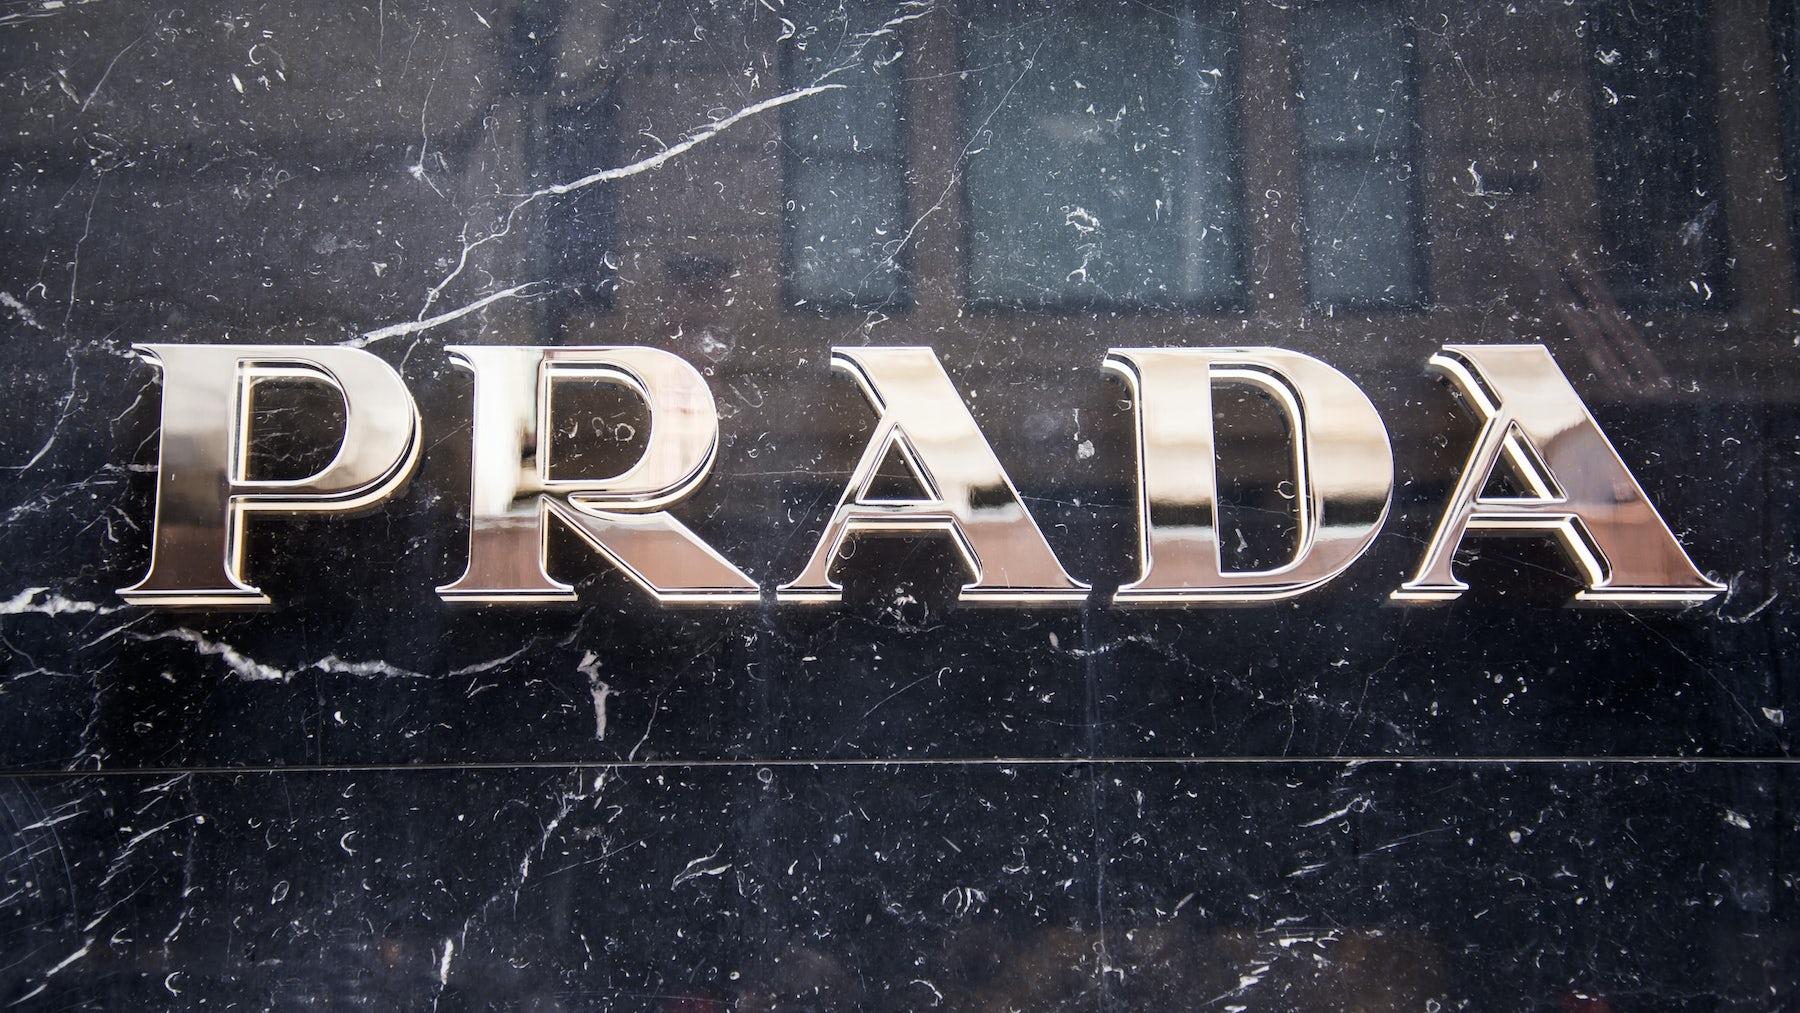 Prada | Source: Shutterstock